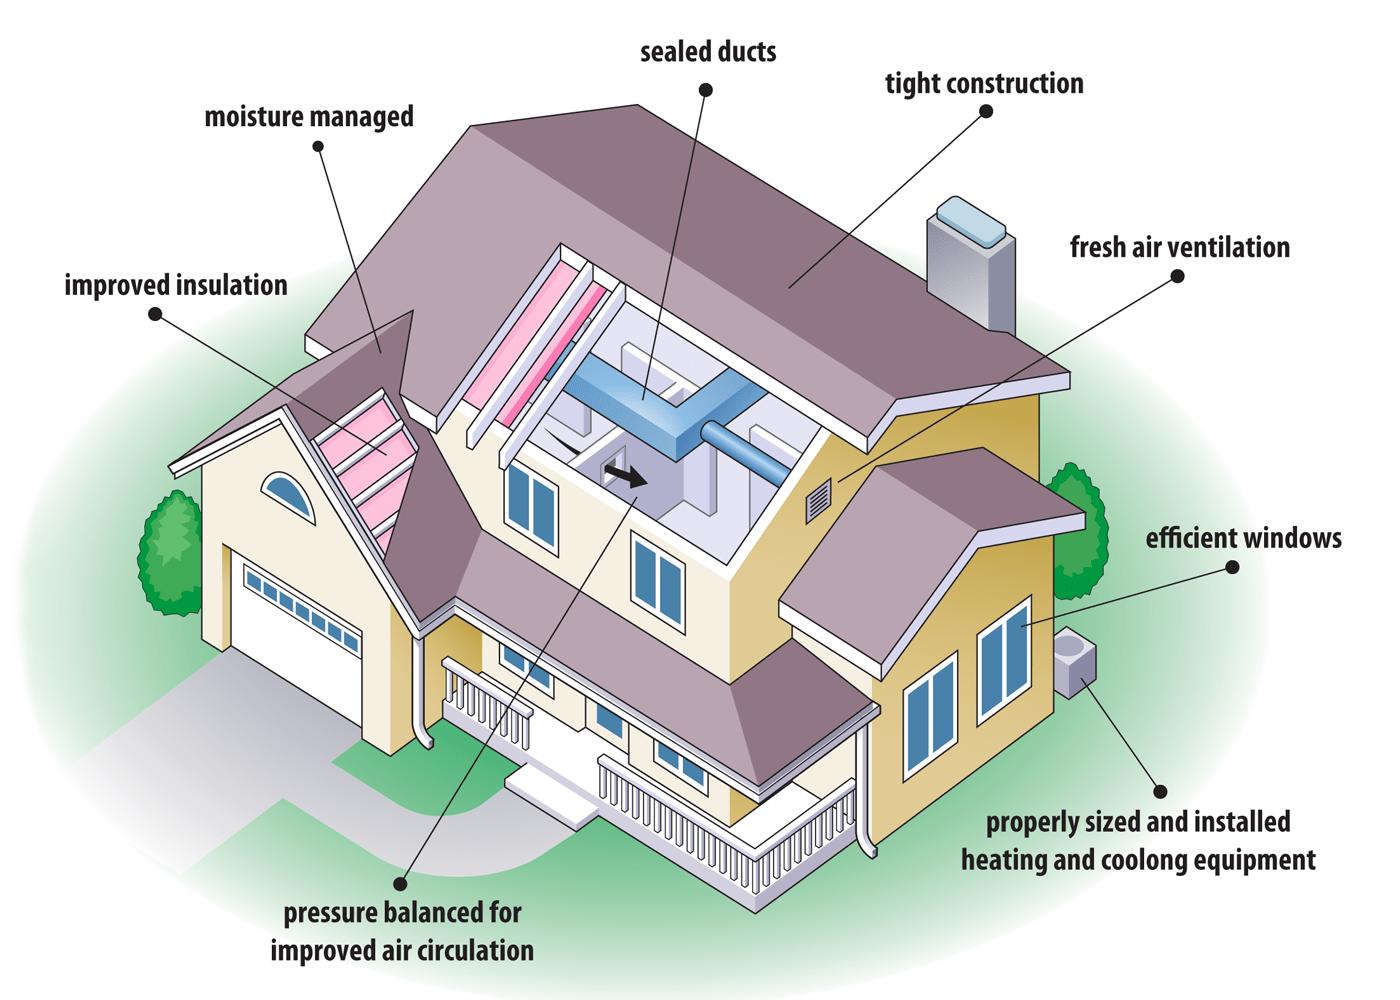 Energy Efficient House Plans Diagram Showing The Various Aspects